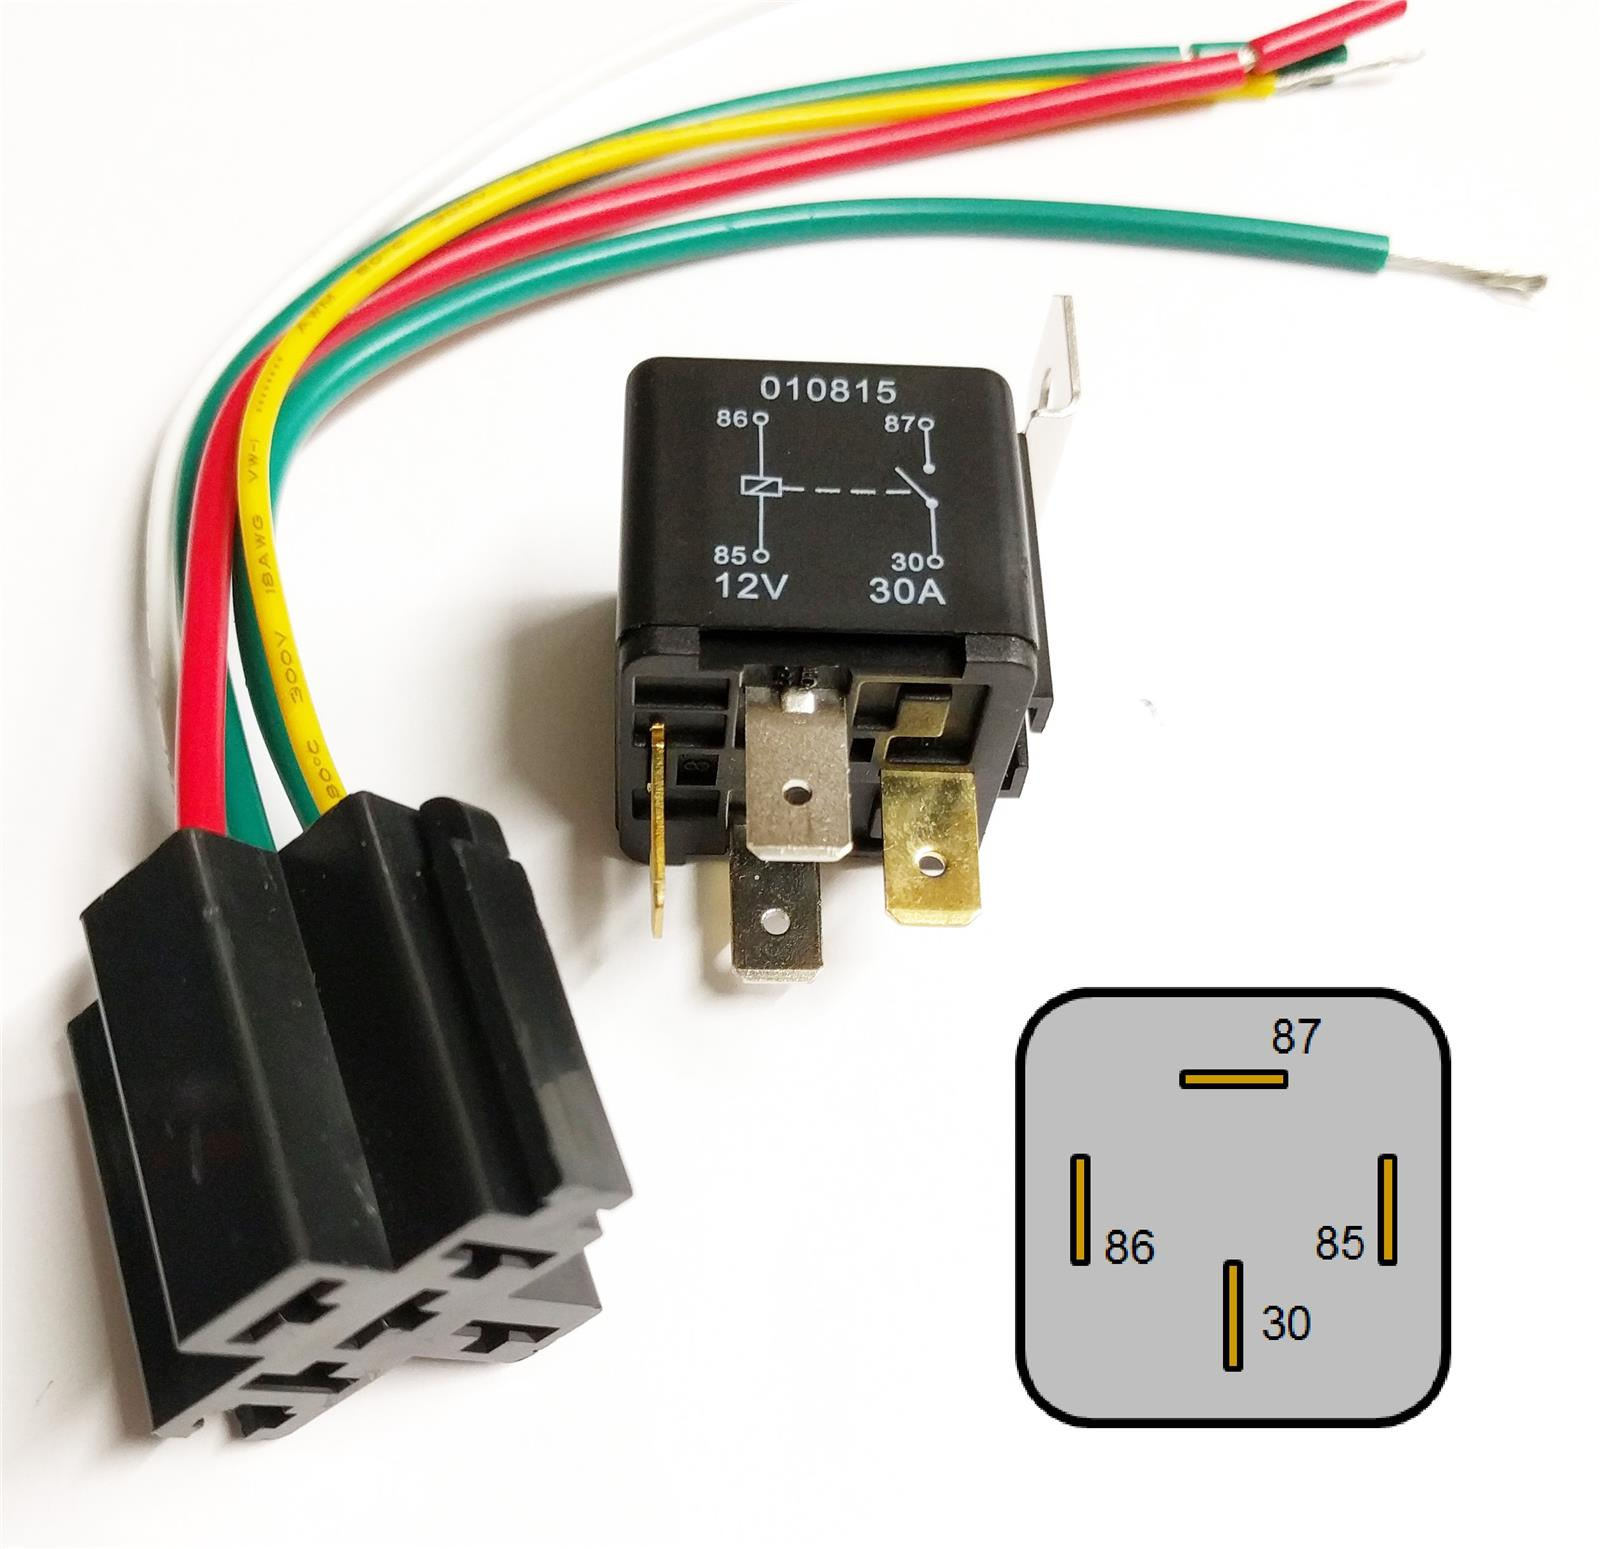 30 amp relay fuse box - wiring diagram schematic agency-format-a -  agency-format-a.aliceviola.it  aliceviola.it